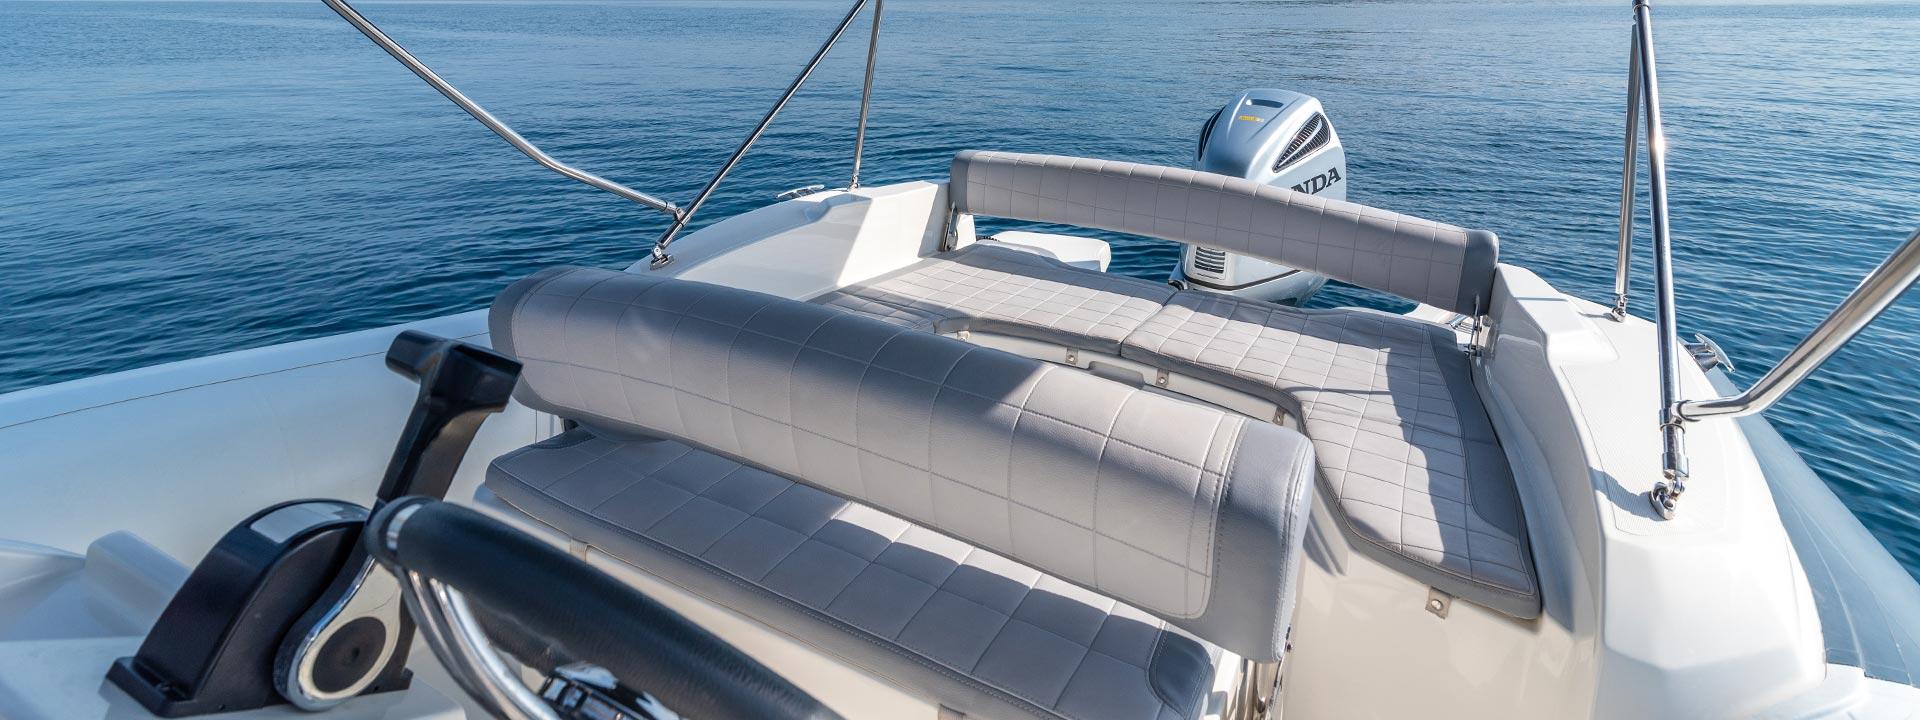 mayer-charter-boat-header-jeanneau-marlin-790-05